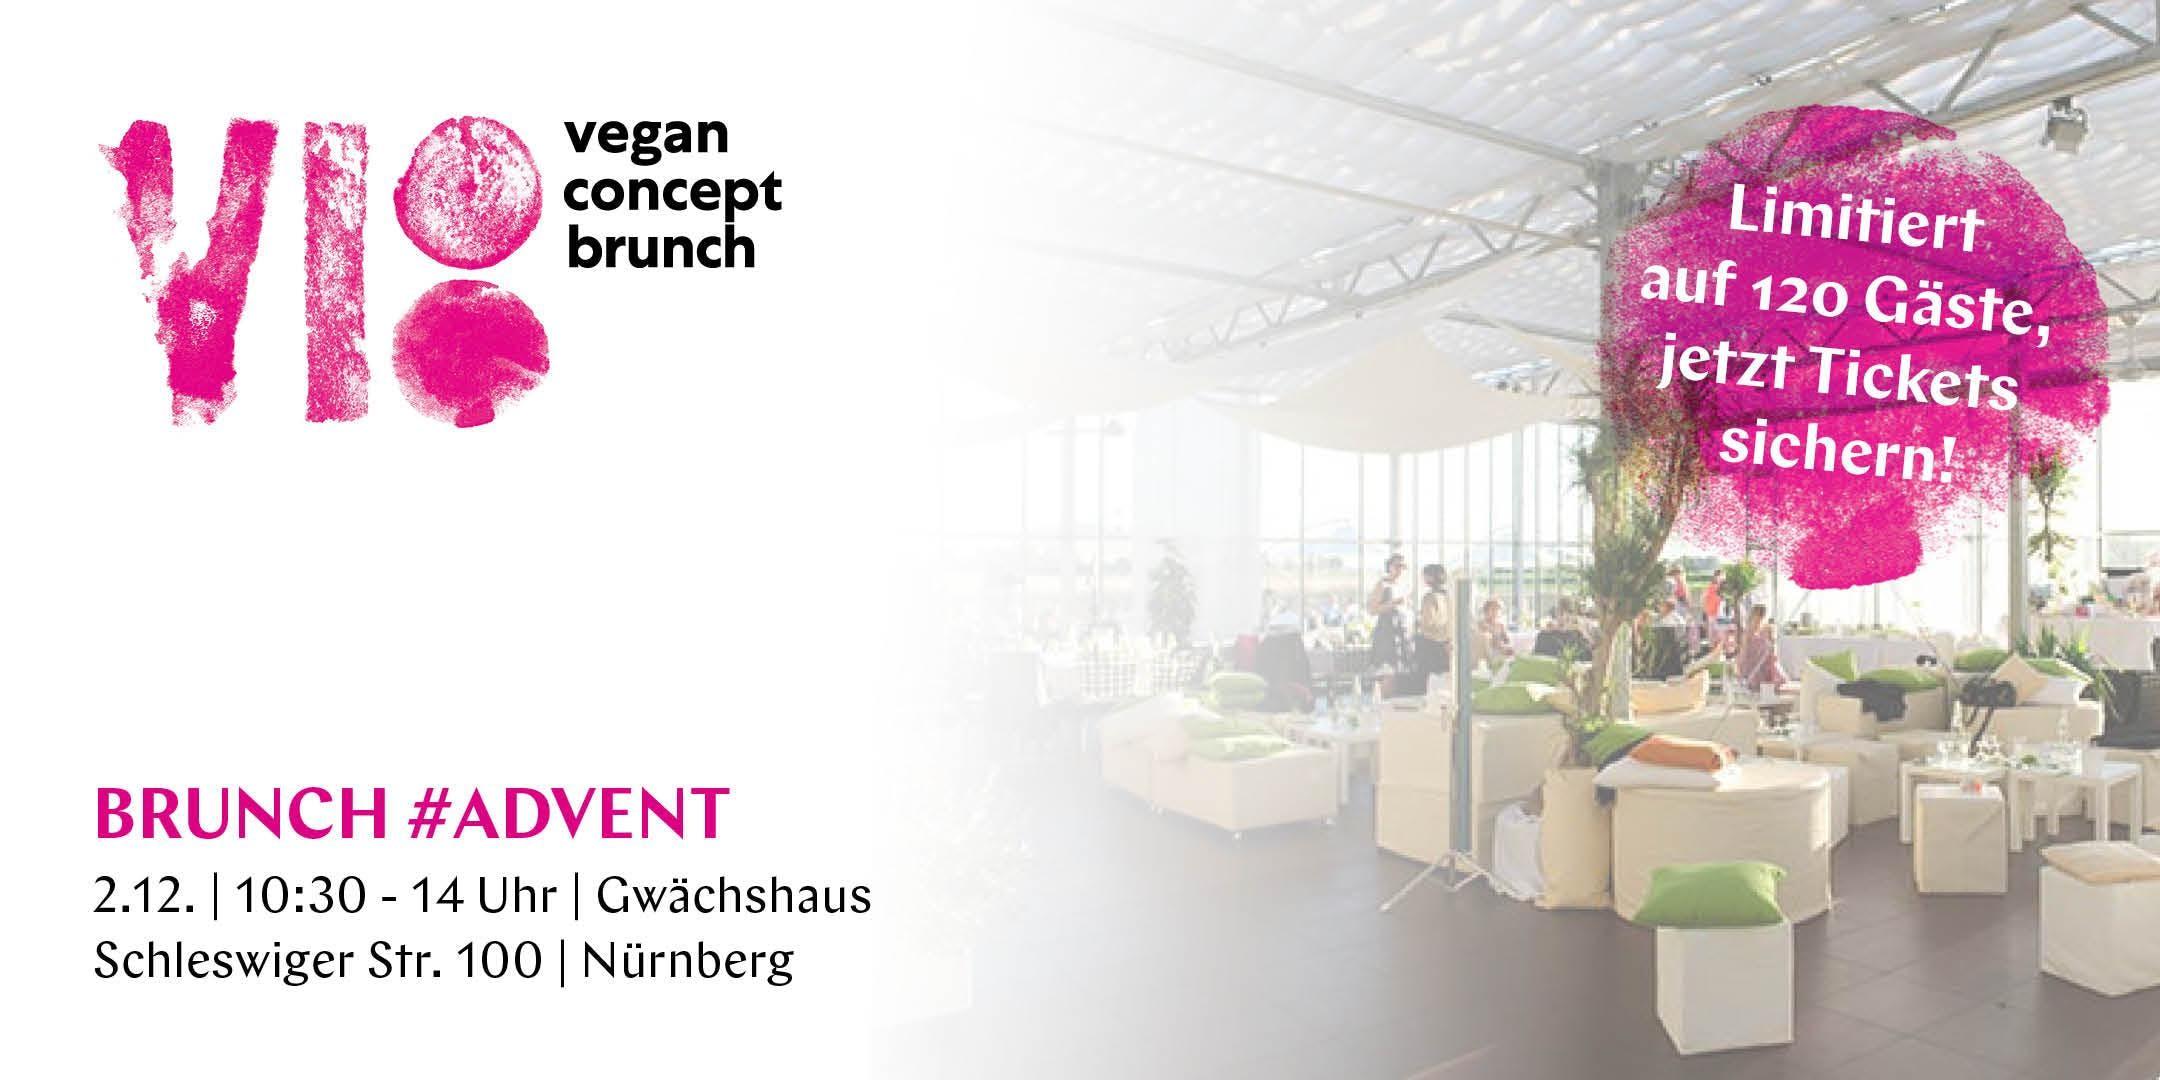 V18 Vegan Brunch Advent Nurnberg 02 12 18 Evensi